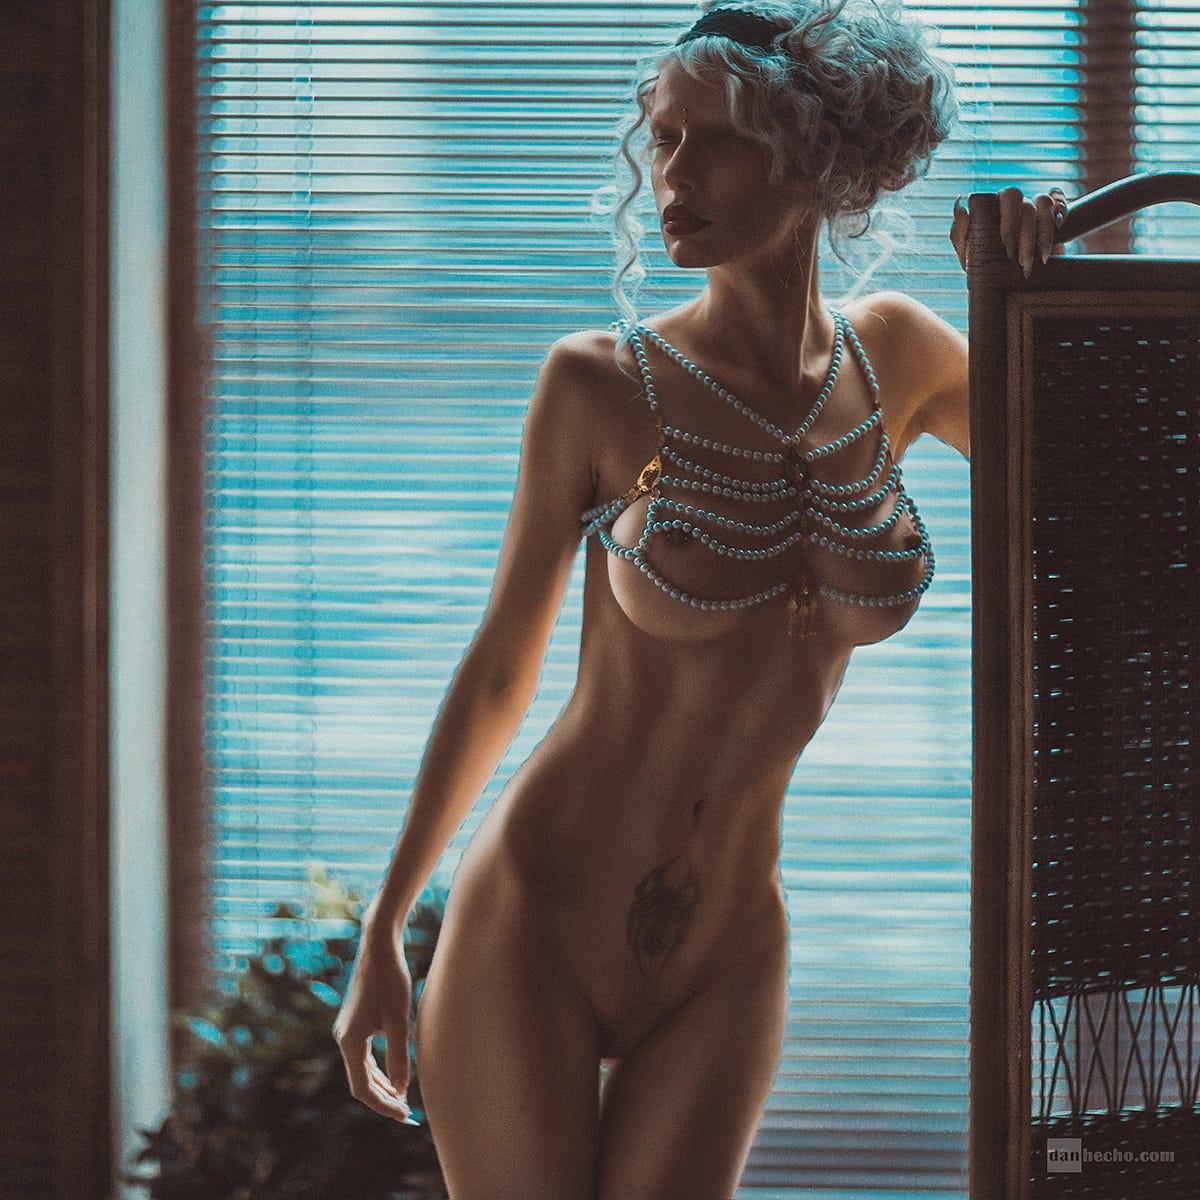 Красивая эротика /фотограф Дан Хечо